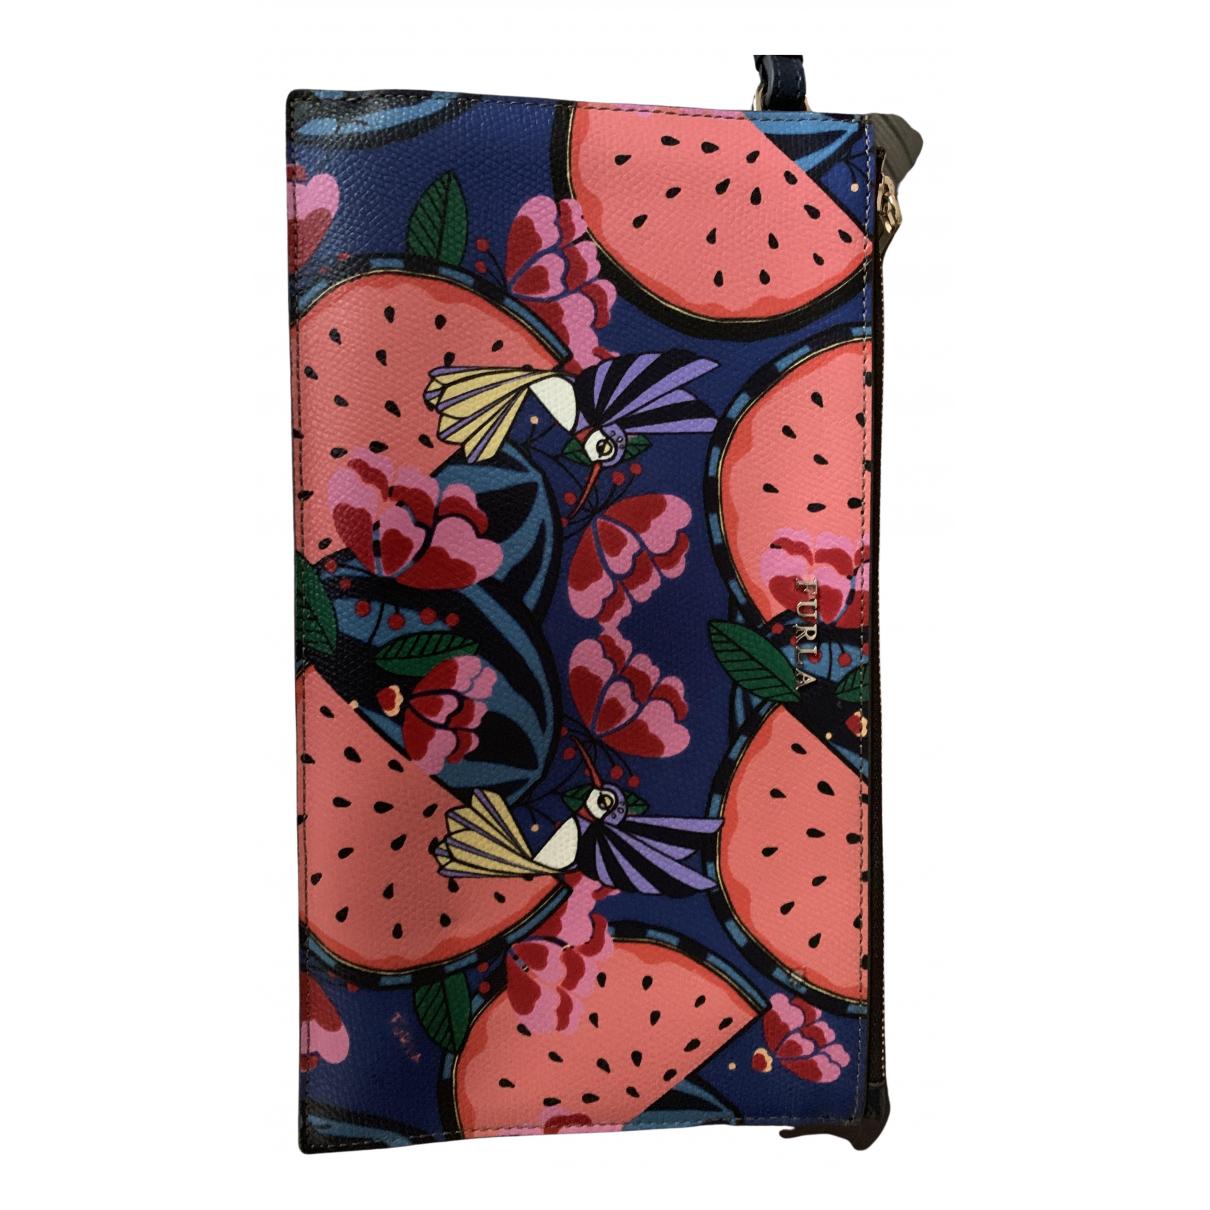 Furla \N Multicolour Leather Clutch bag for Women \N